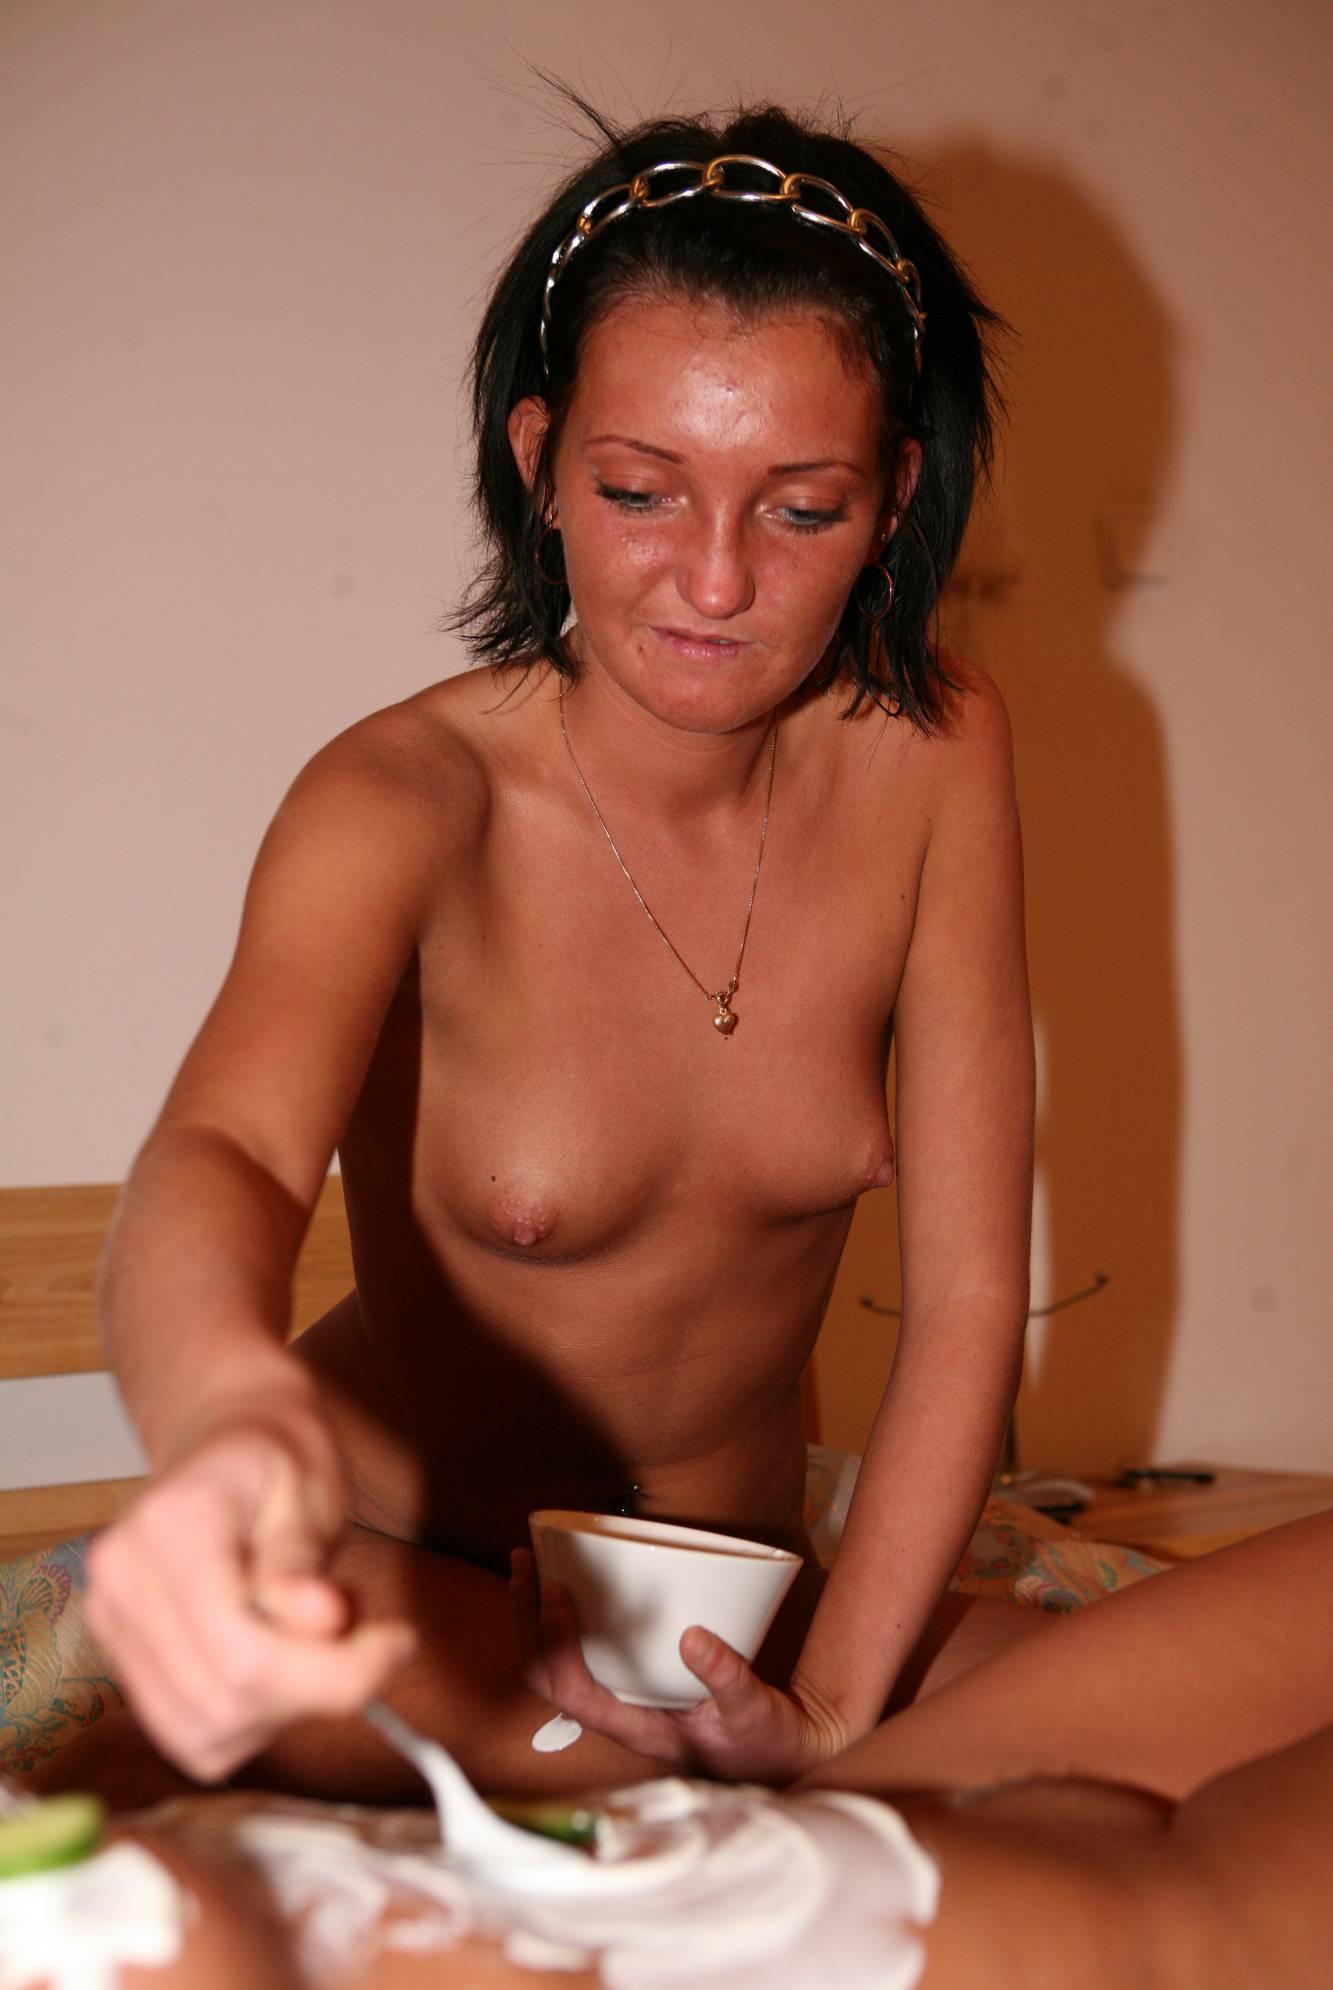 Nudist Pics Jacuzzi Cucumber Mask - 1